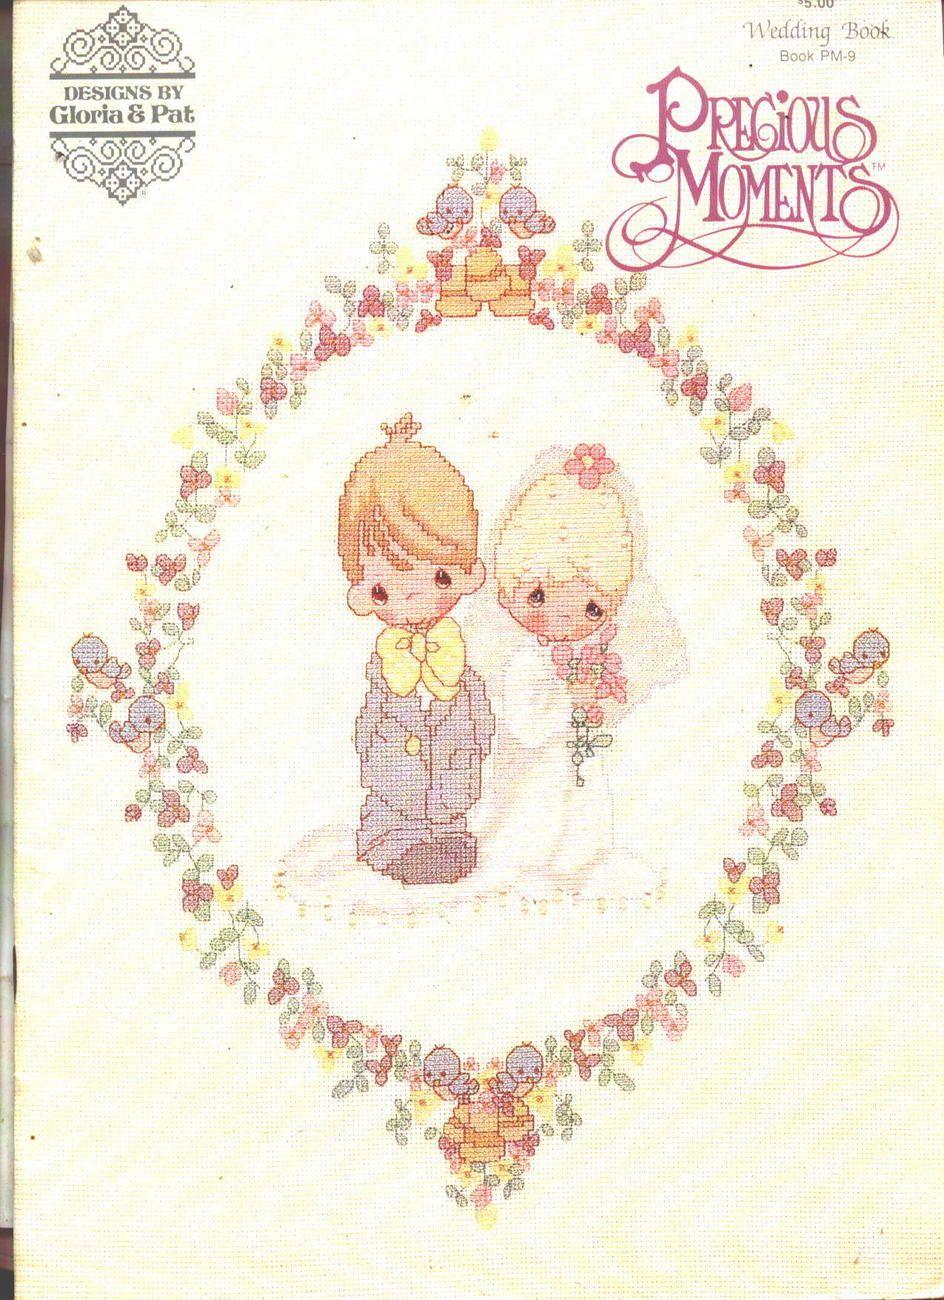 Precious Moments Wedding Book Cross Stitch Patterns Bride Groom